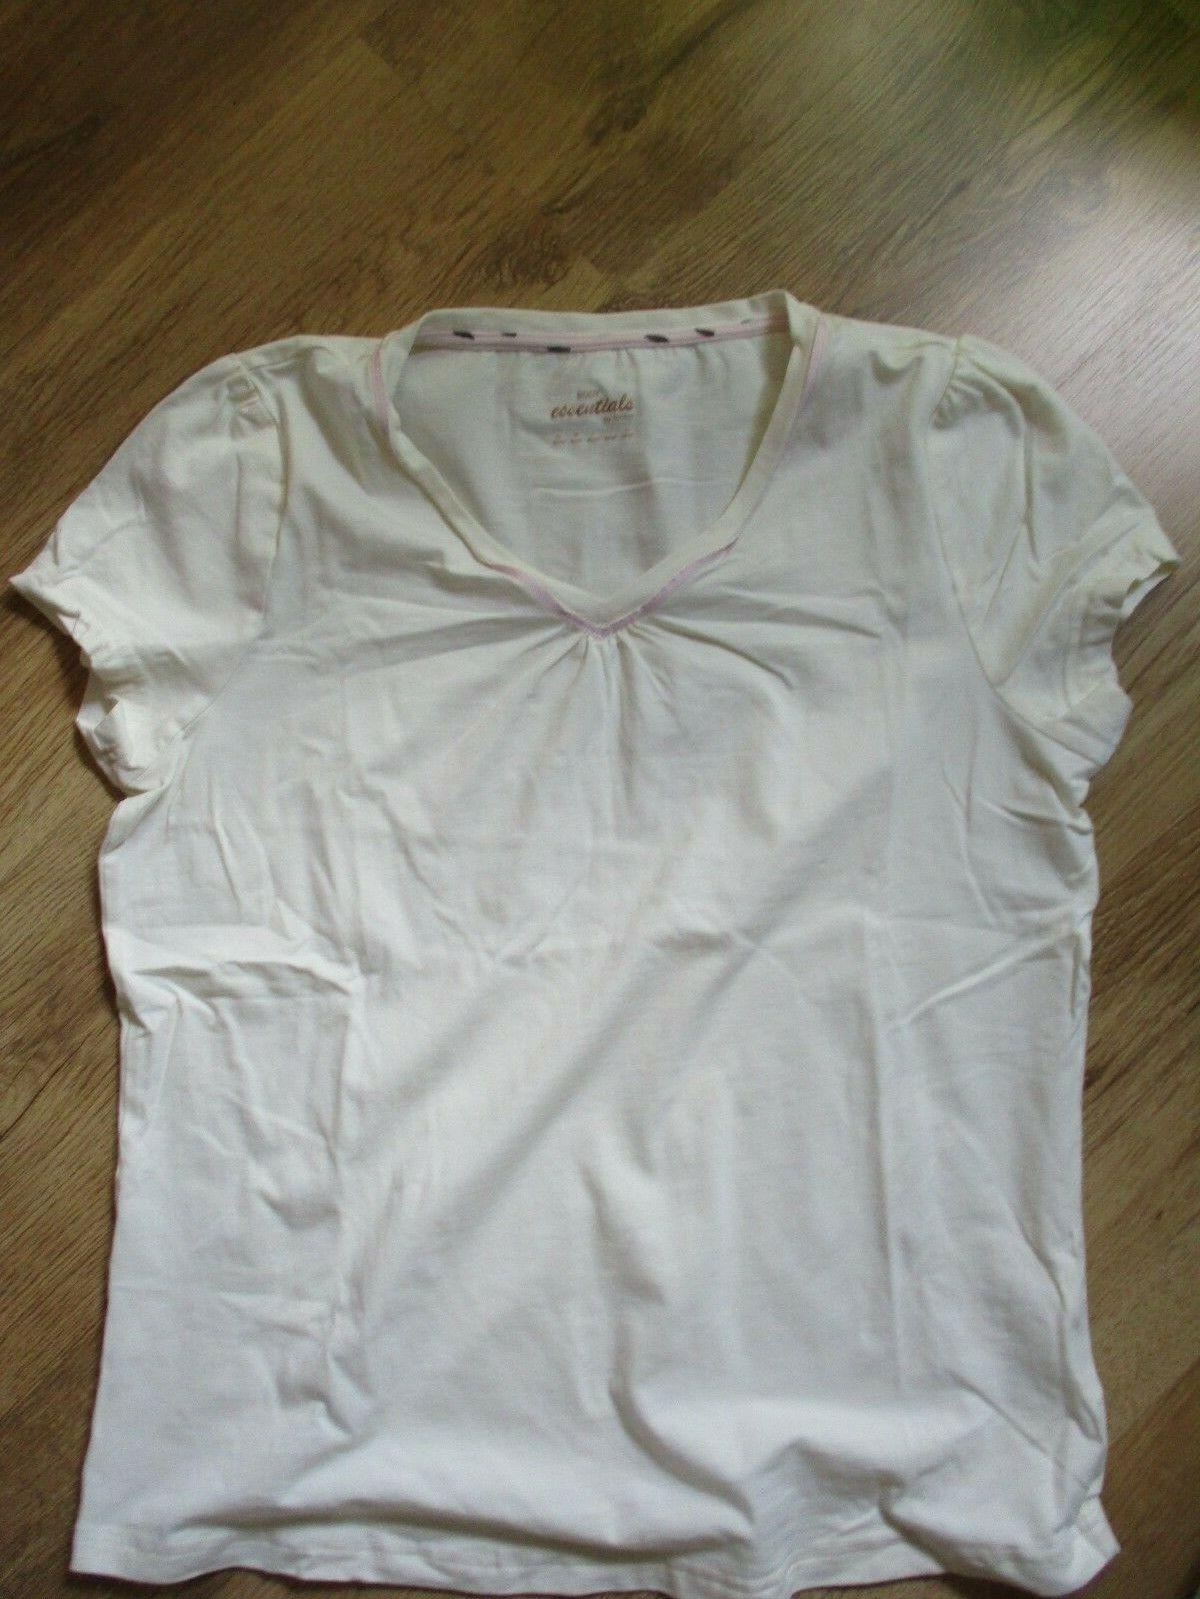 Body by Tchibo Schlafanzug Gr. 40/42 - NEU-ungetragen - Capri